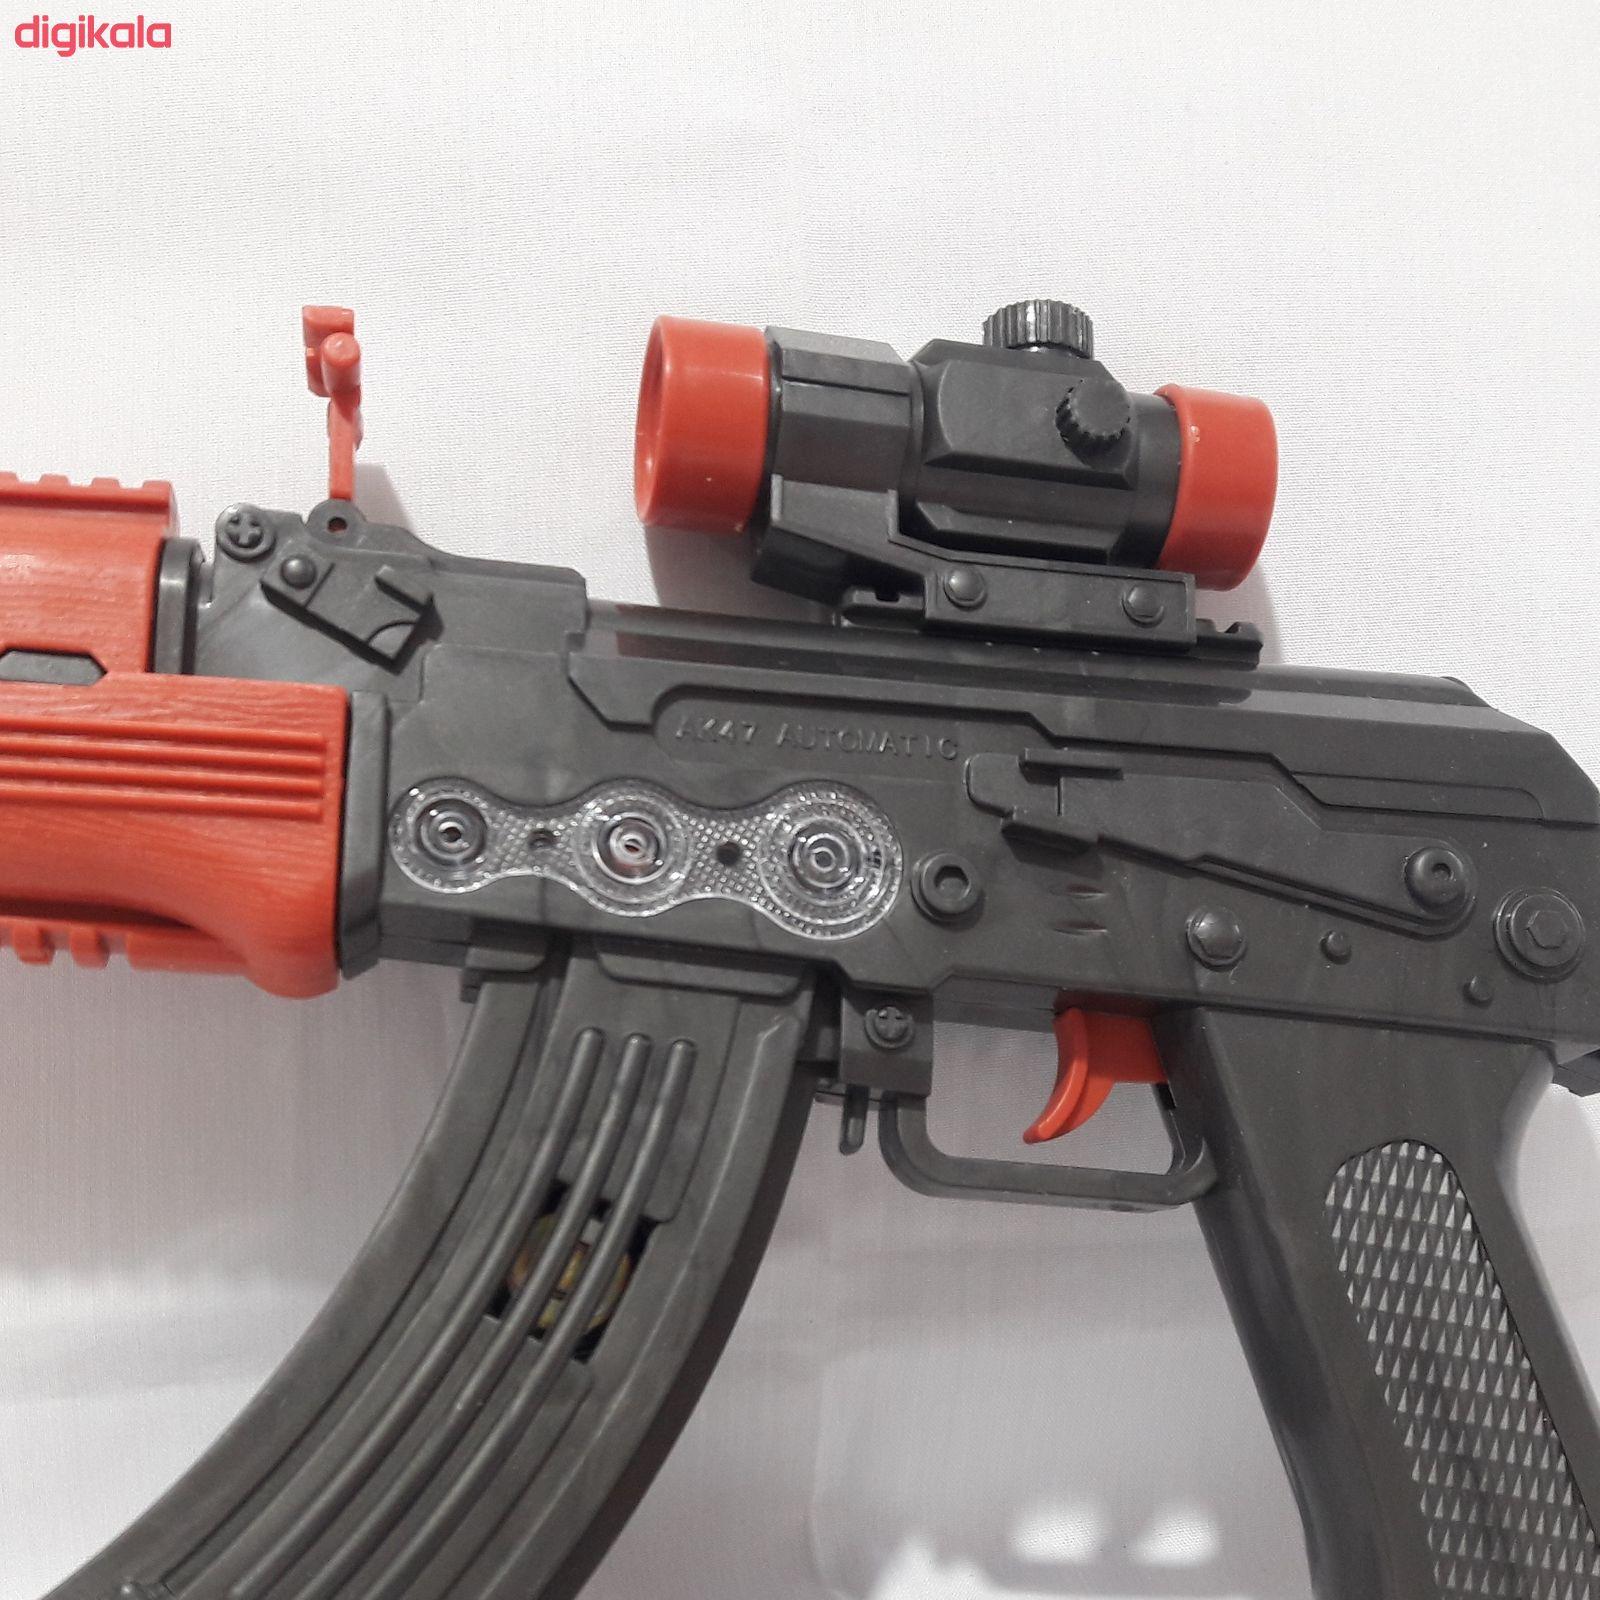 تفنگ بازی مدل مسلسل دوربین دار کد BKH18 main 1 2